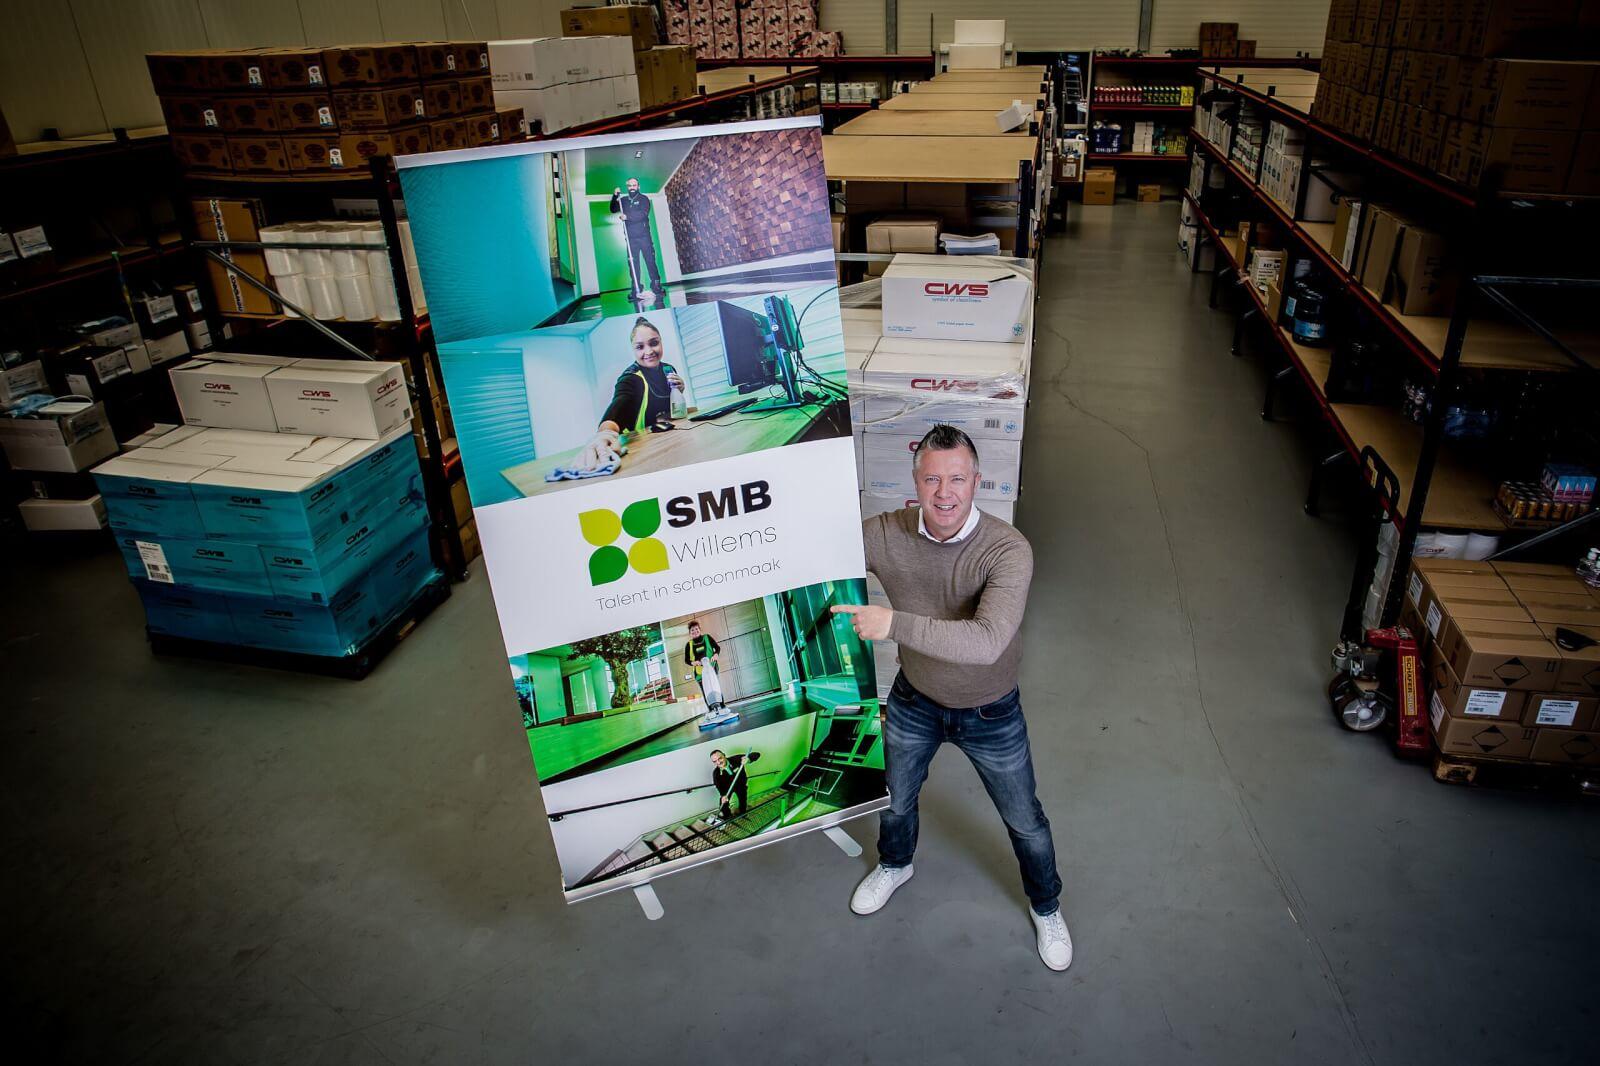 SMB Willems: Talent in Schoonmaak